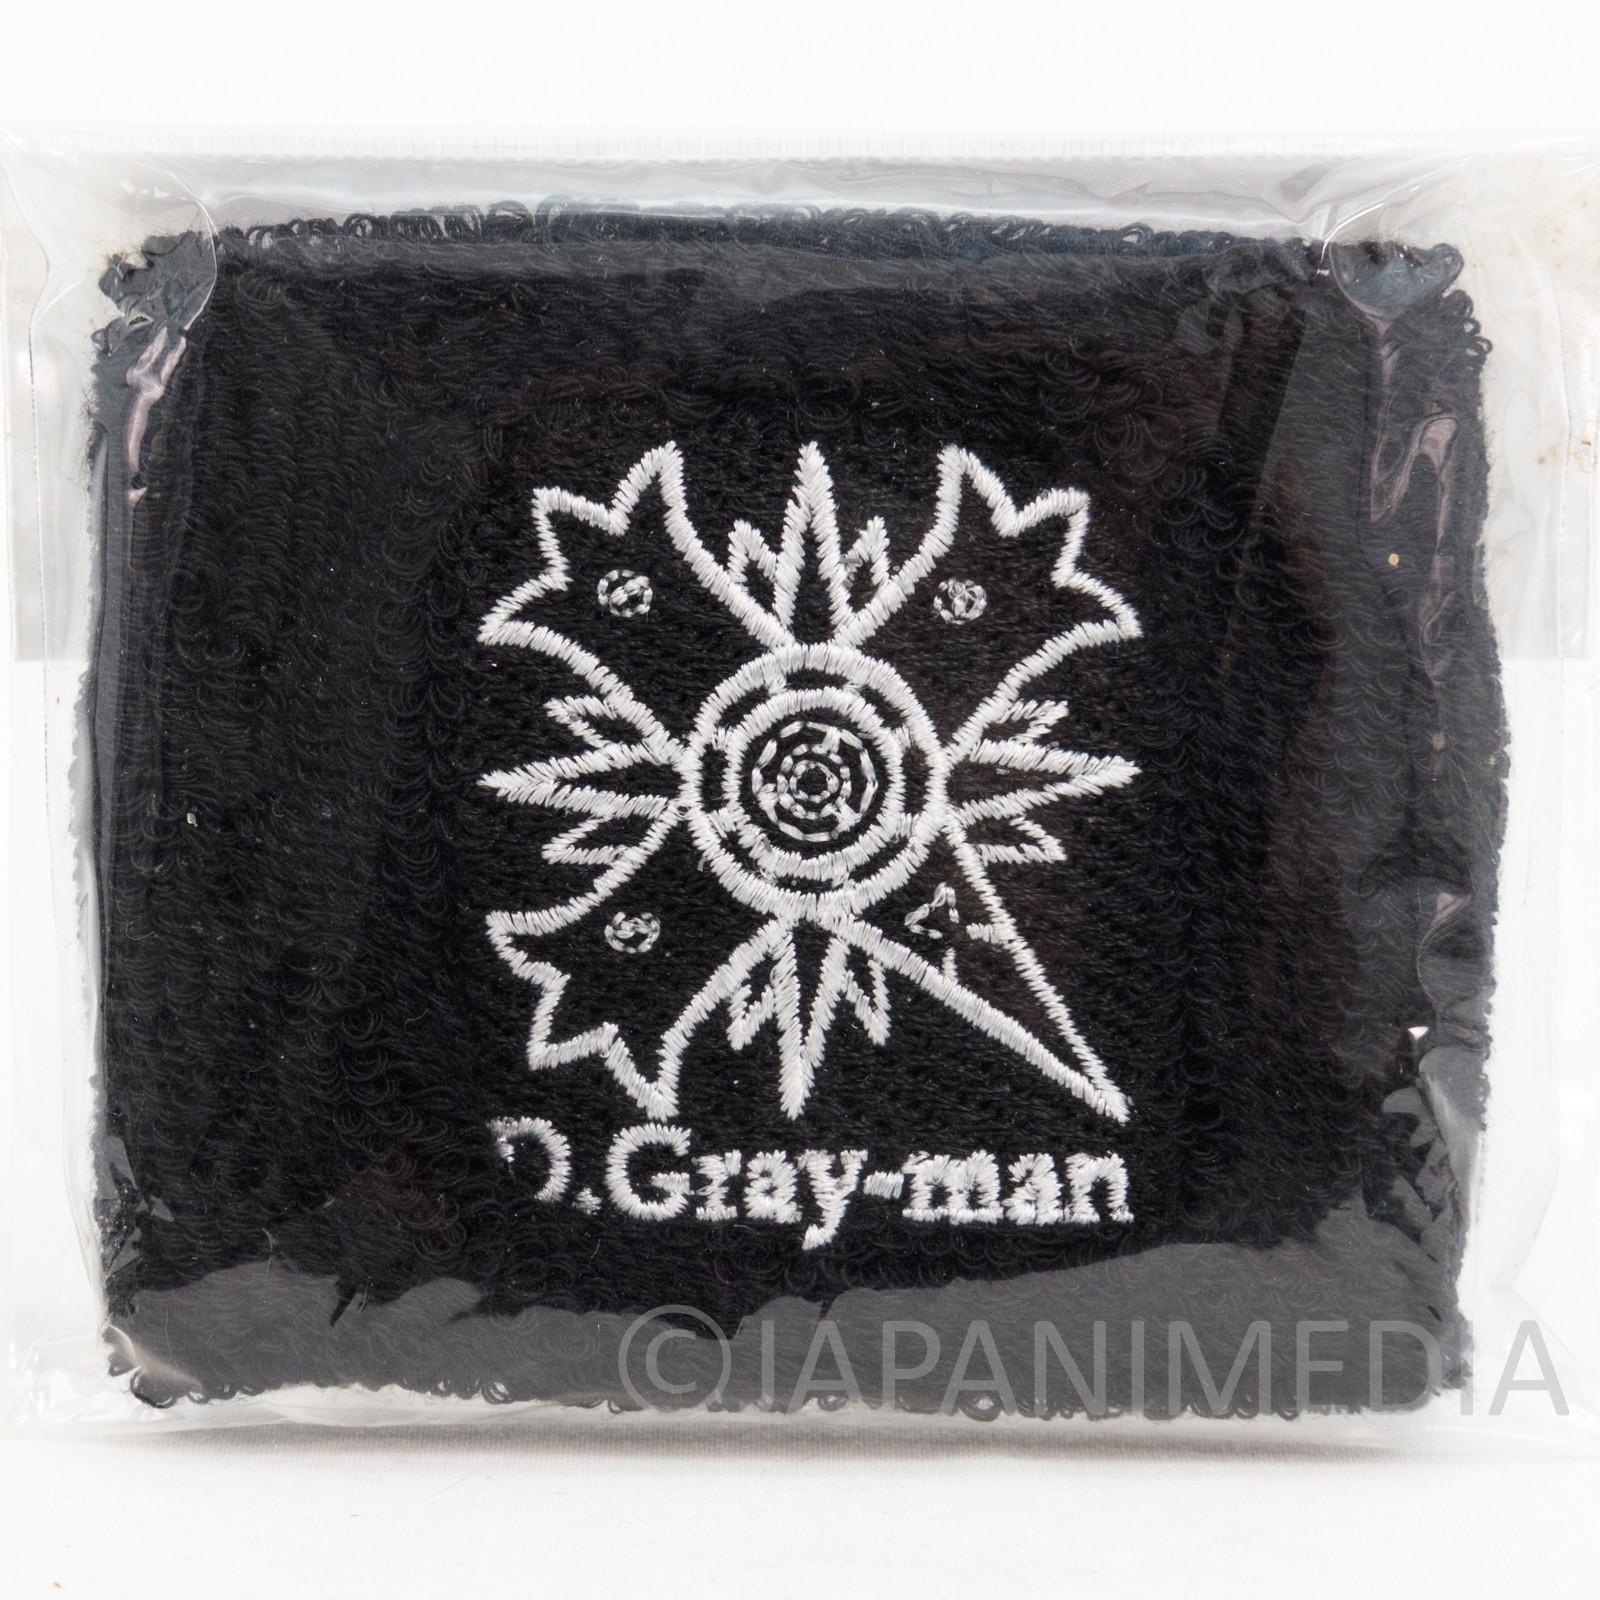 D.Gray-man Black Order Rose Cross Wristband Shueisha JAPAN